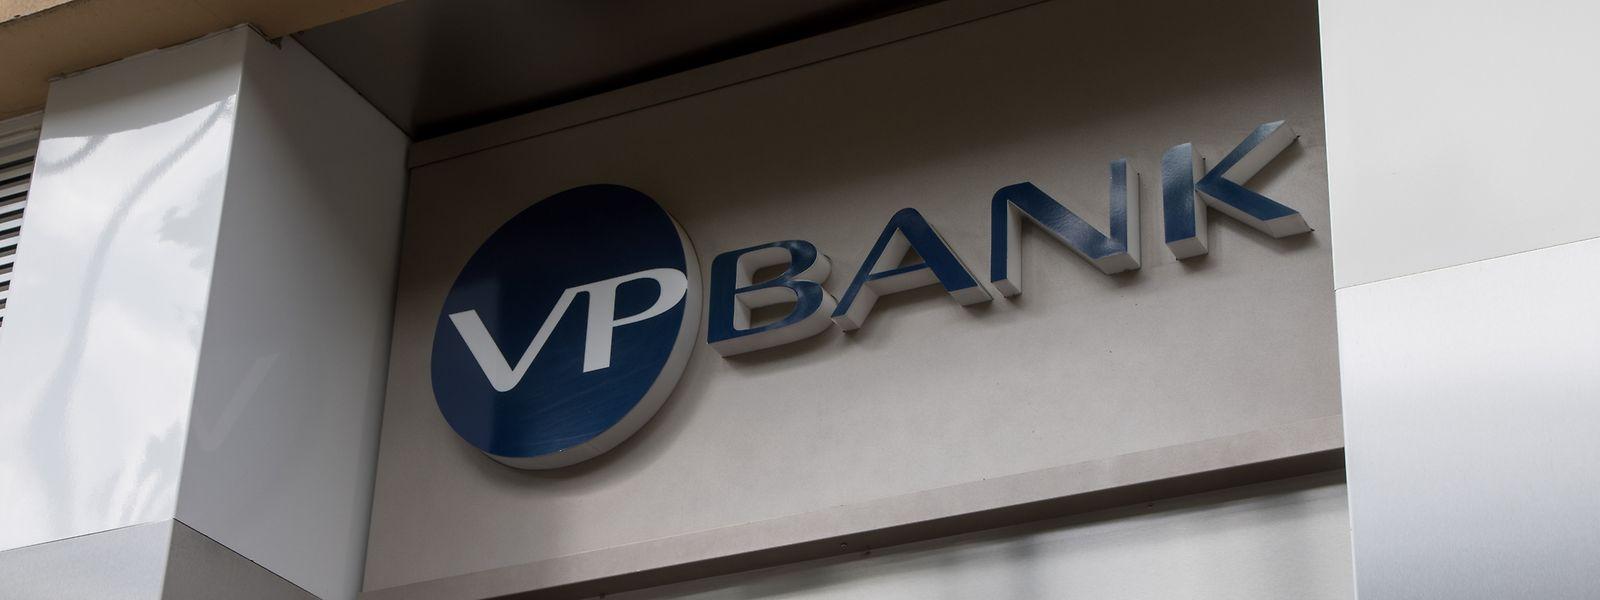 Bislang hat die VPBank-Gruppe ihre Geschäftsräume in der hauptstädtischen Avenue de la Liberté.